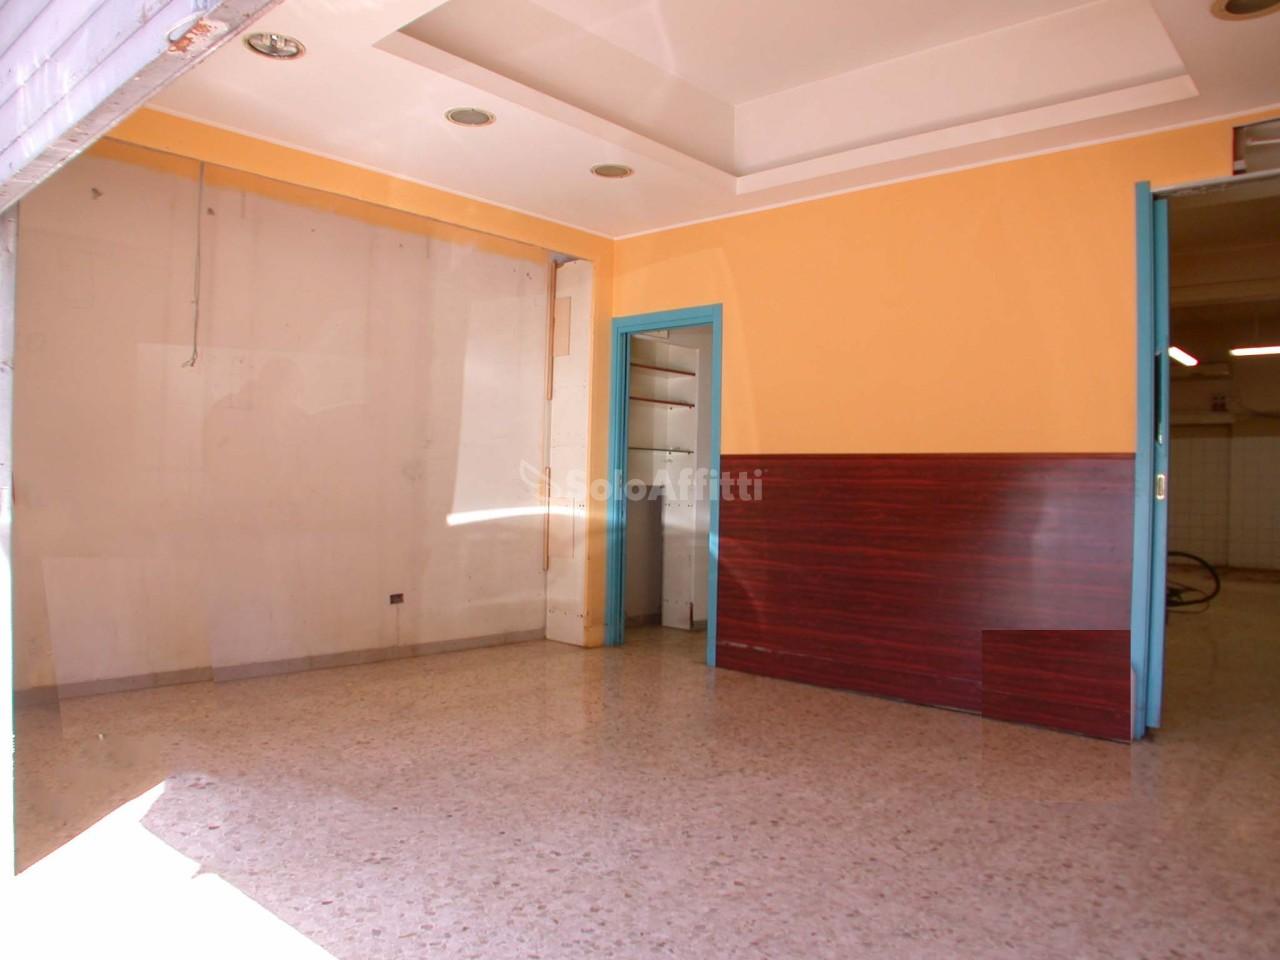 Laboratorio a Montegranaro, Pesaro Rif. 4134928